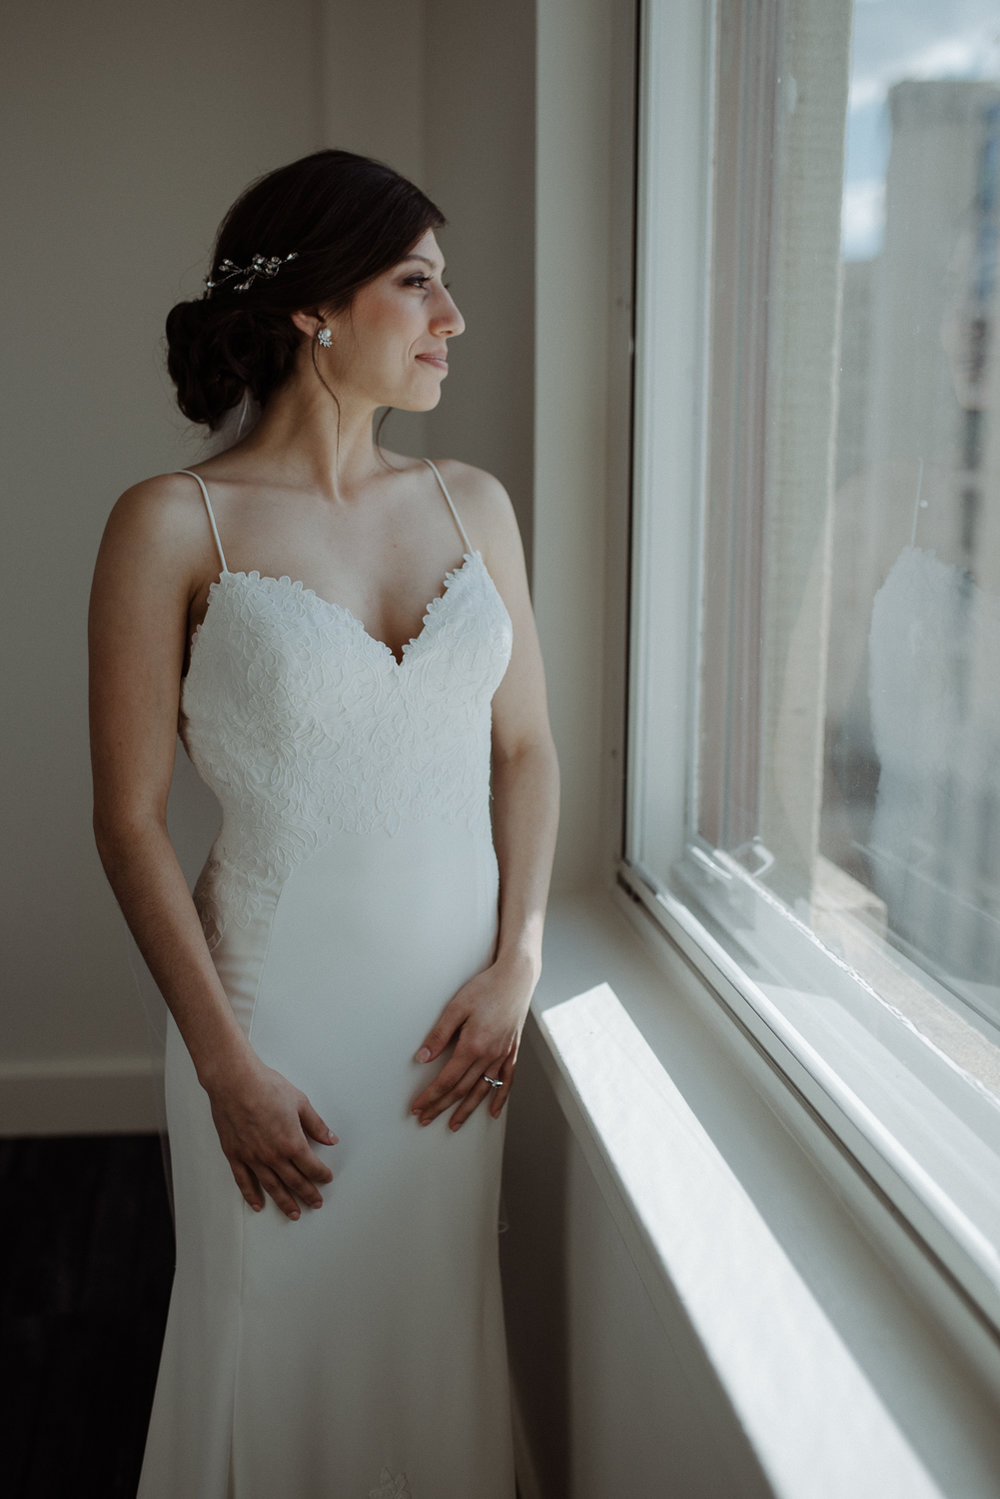 Enowen-Photography-wedding-raleigh-cannon-room-vivian-devon (13 of 56).jpg